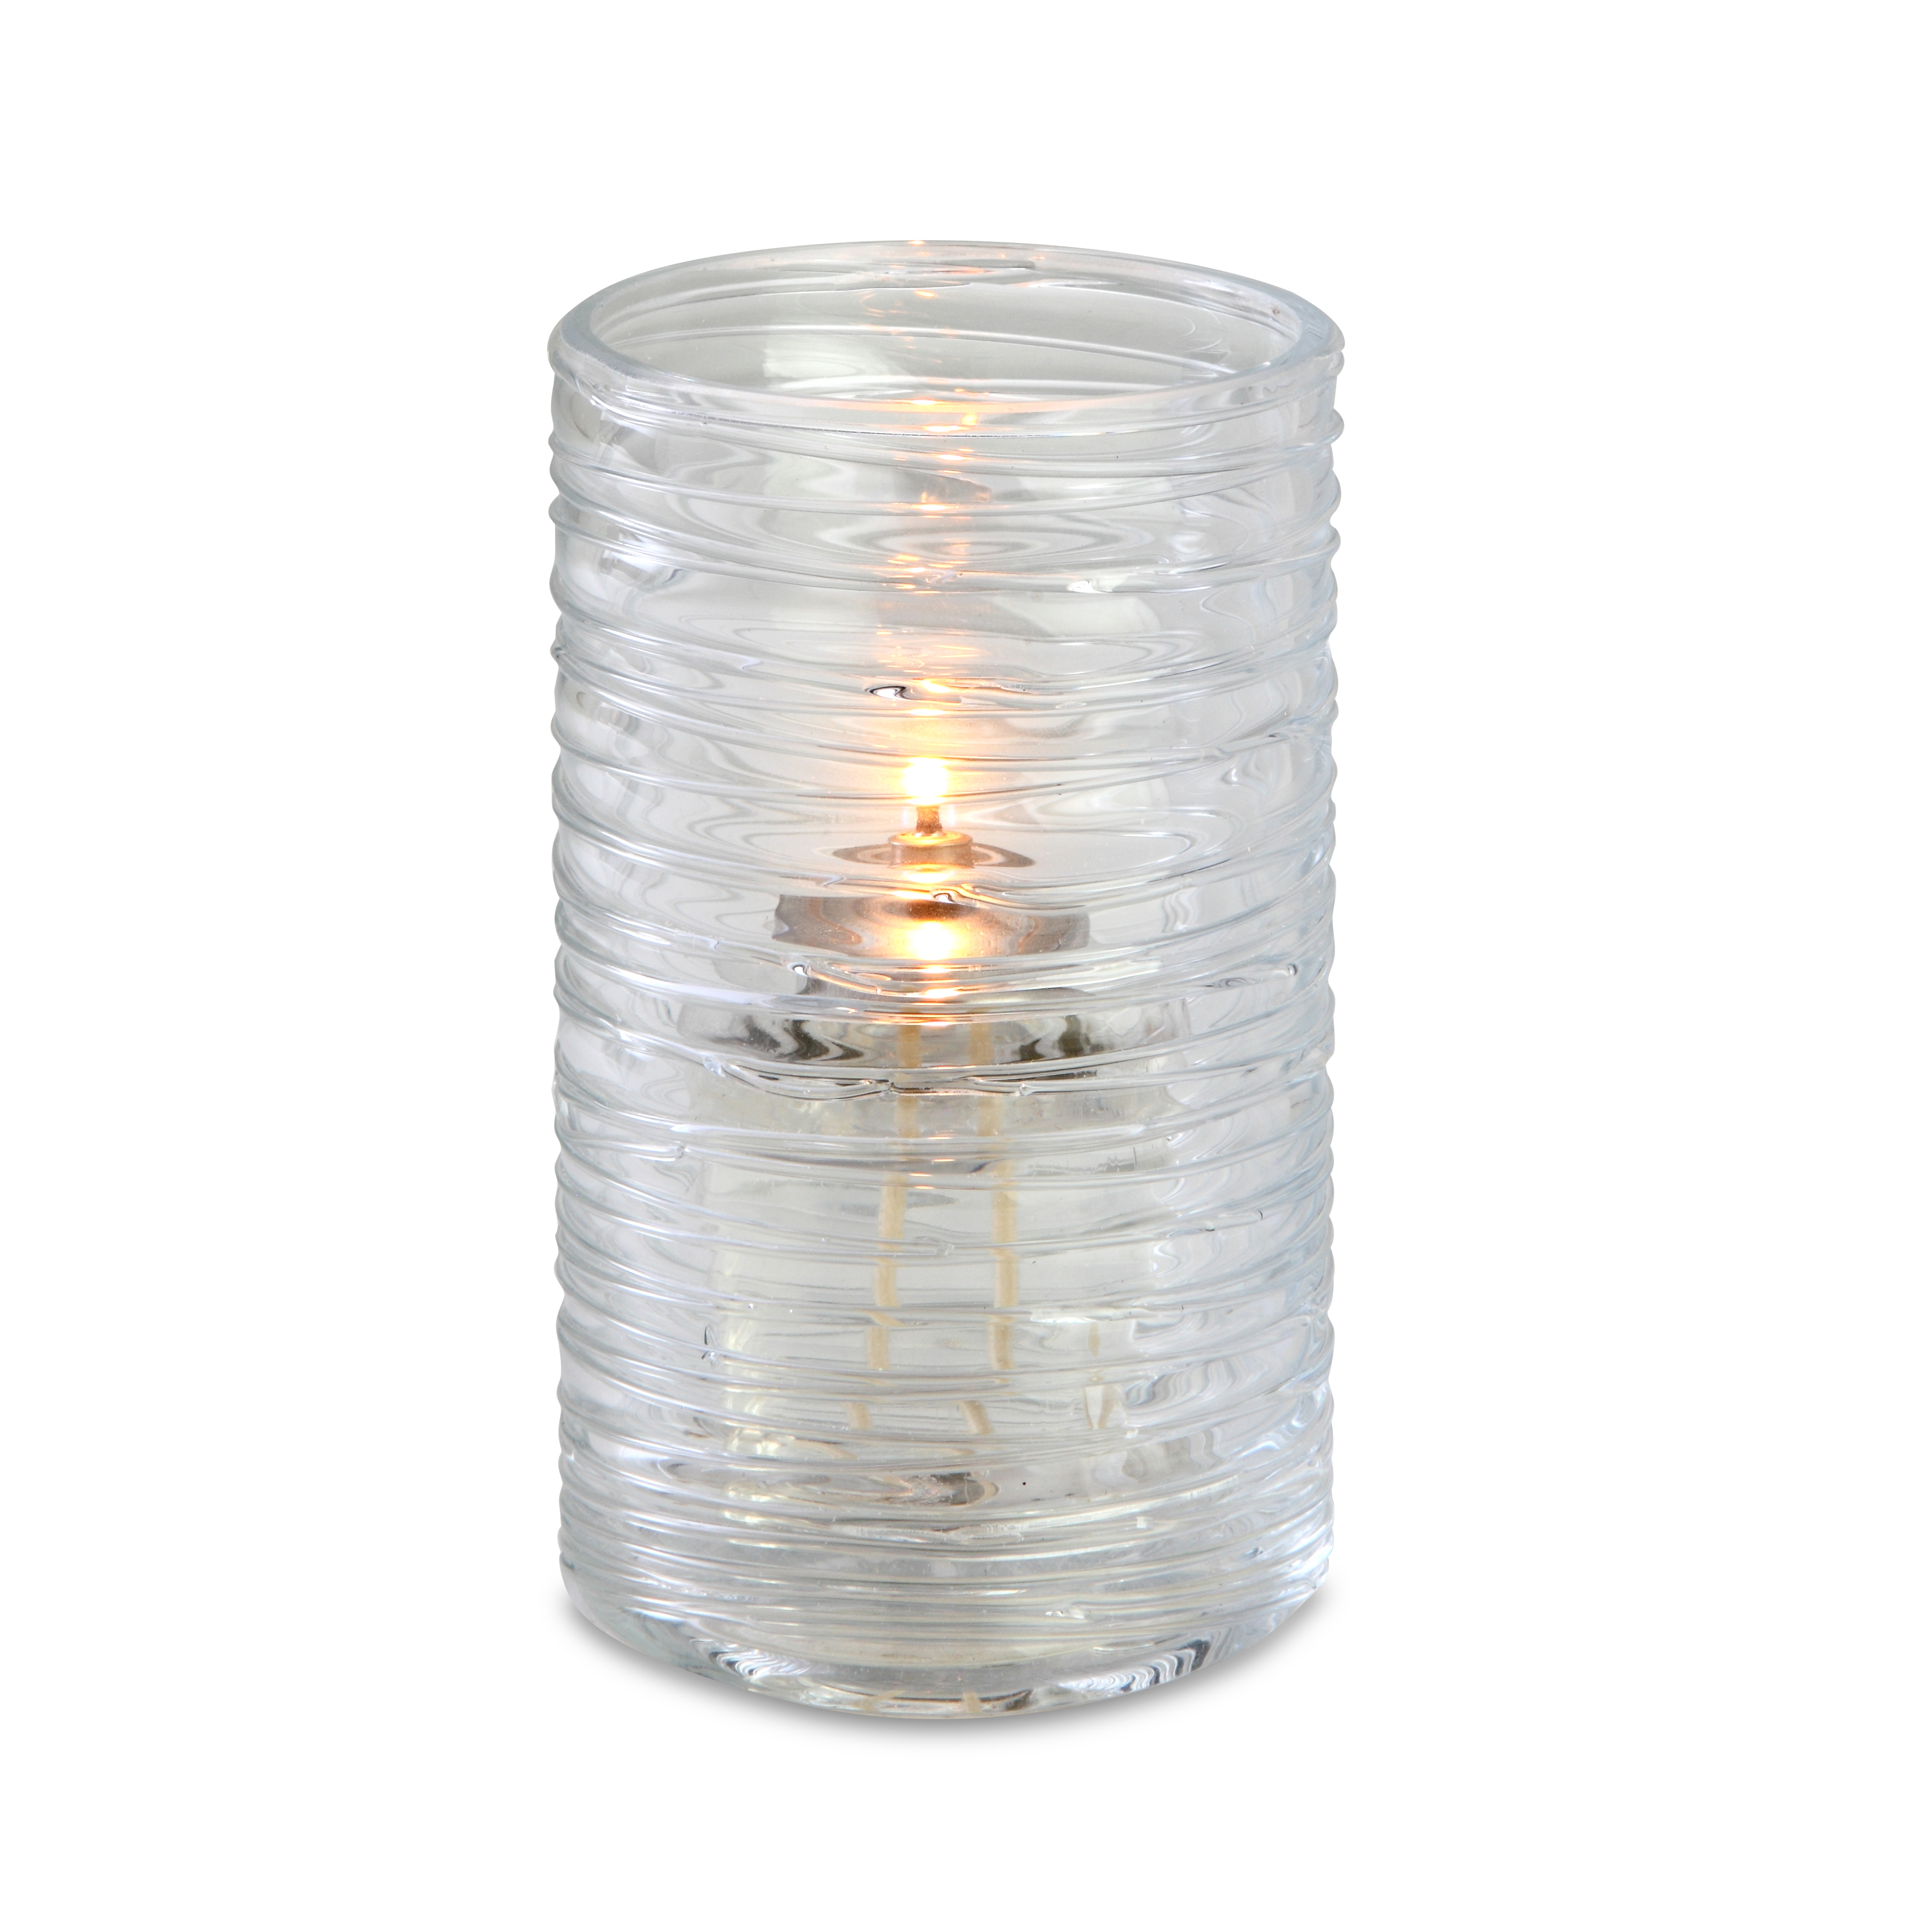 Sterno 80254 lamp